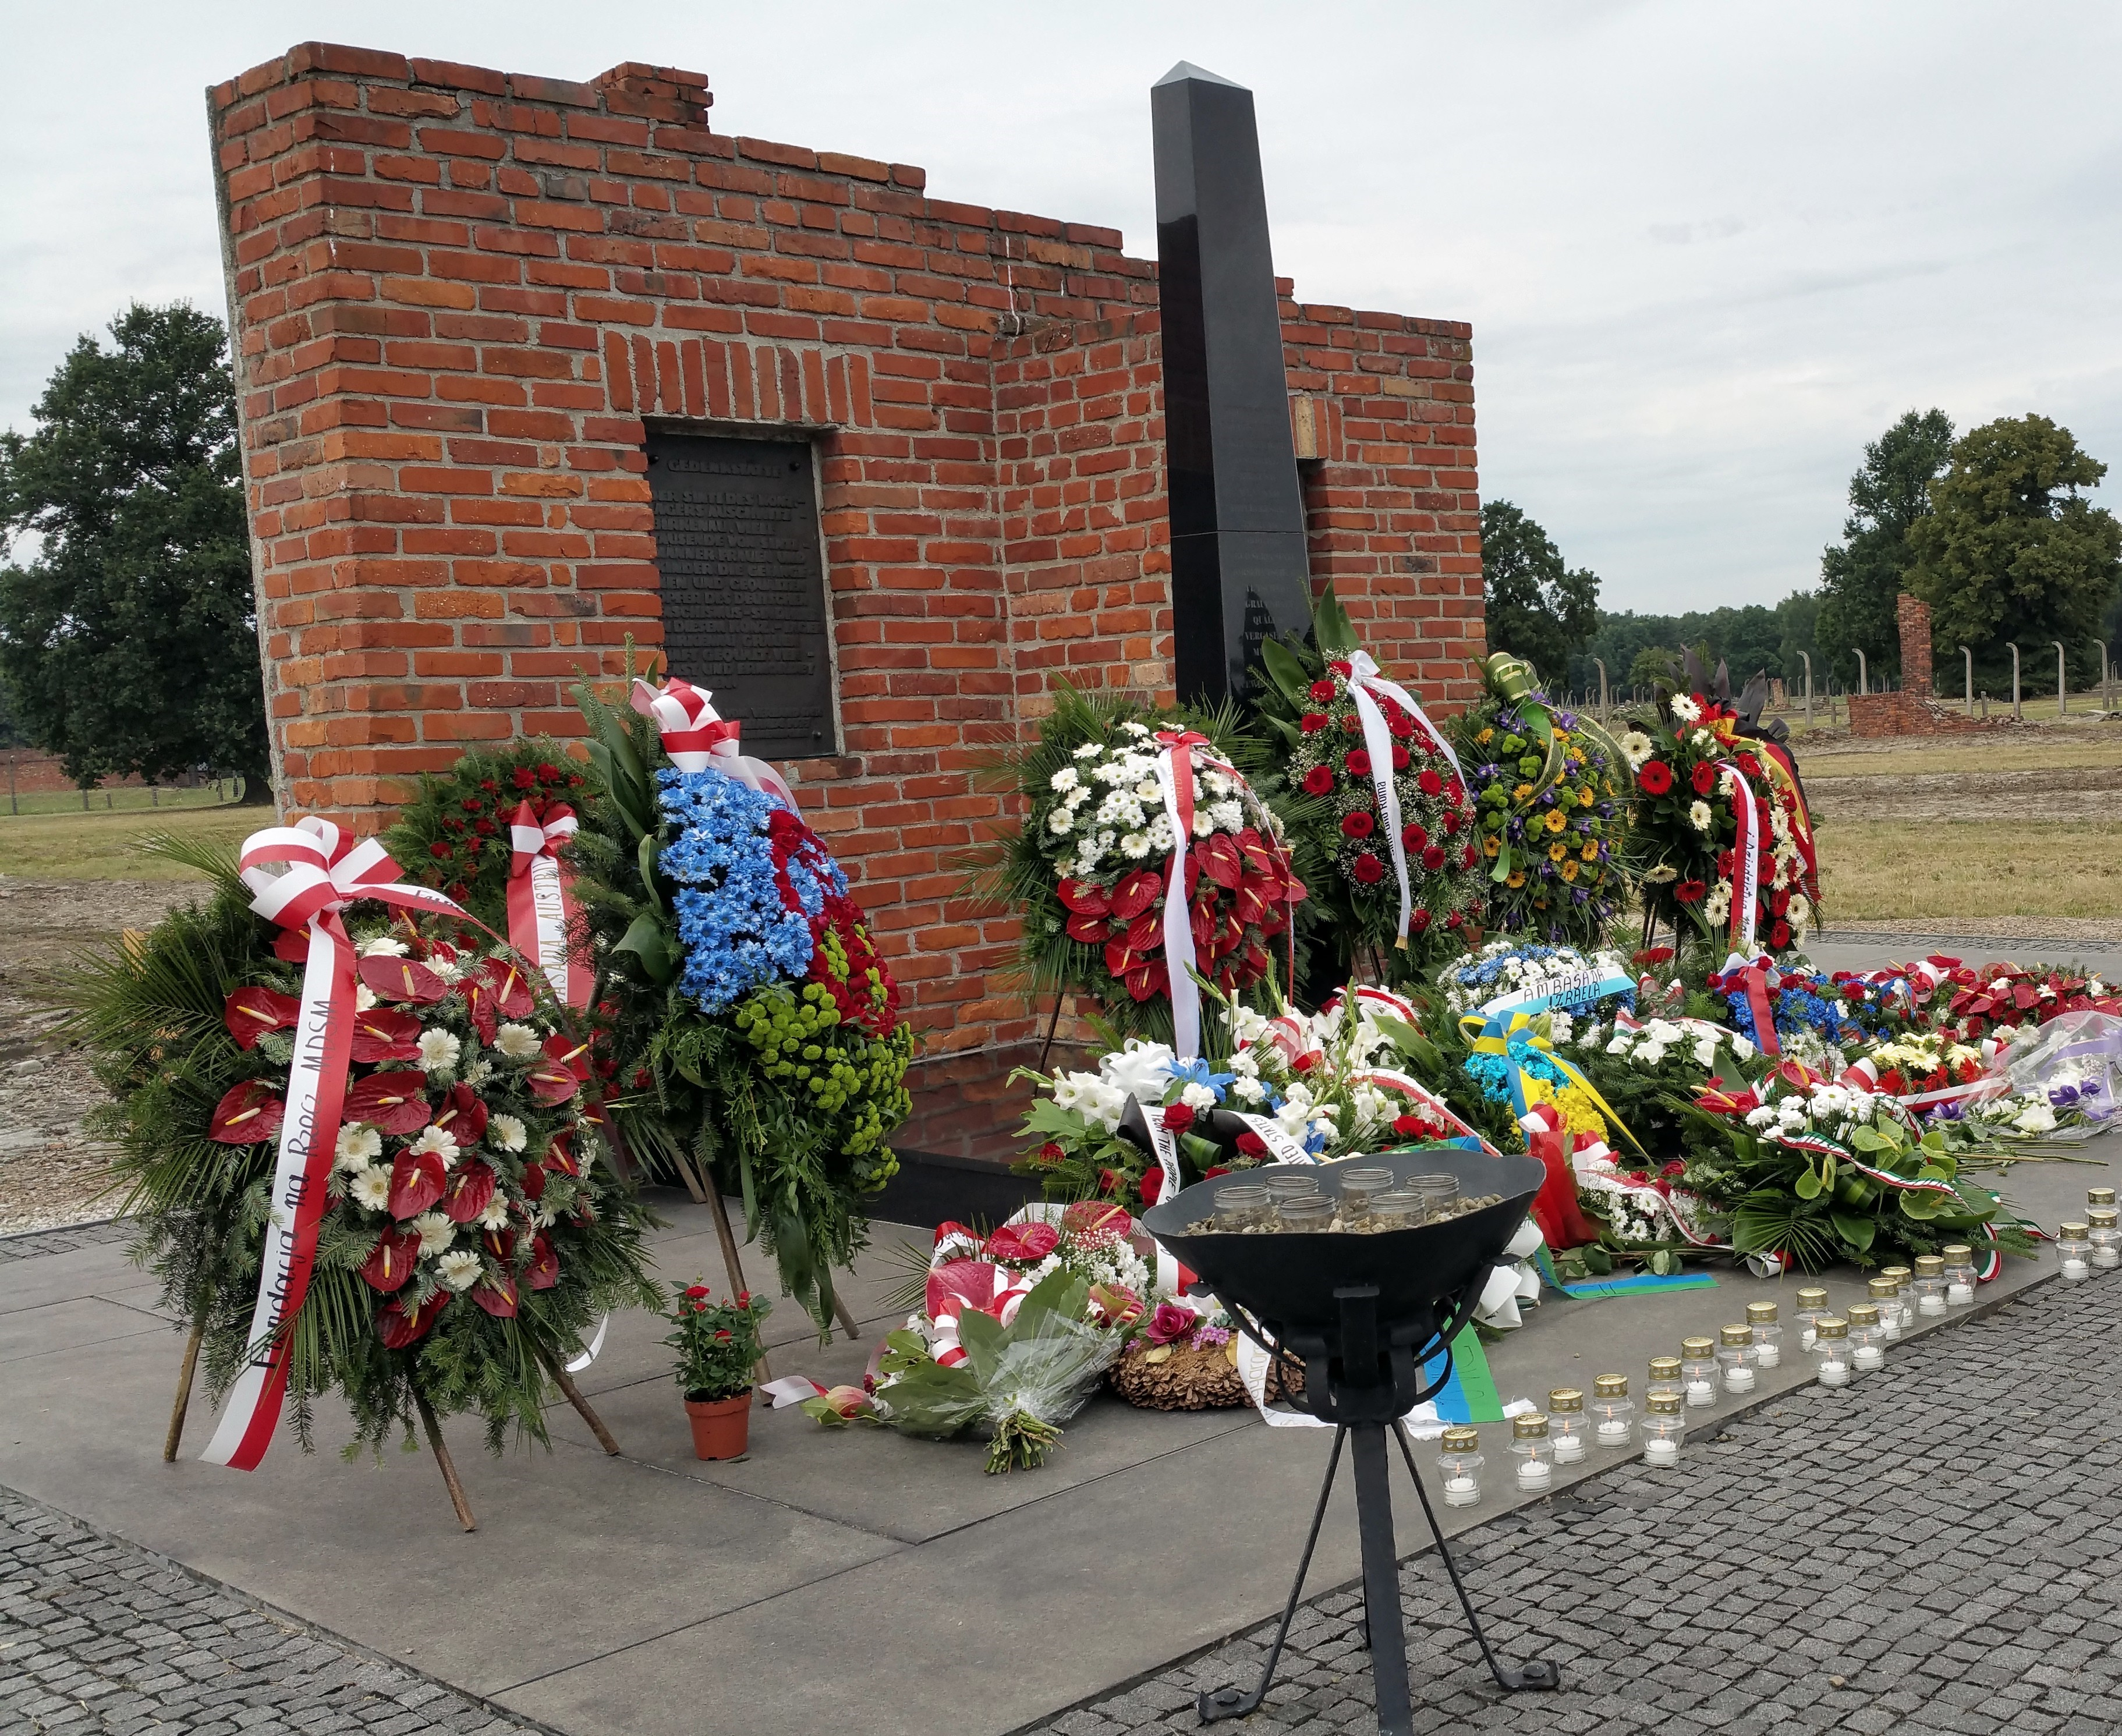 CAPAStudyAbroad_William_New_Interview_-_Commemoration_of_liquidation_of_Gypsy_camp_Auschwitz-Birkenau_8.3.2015.jpg